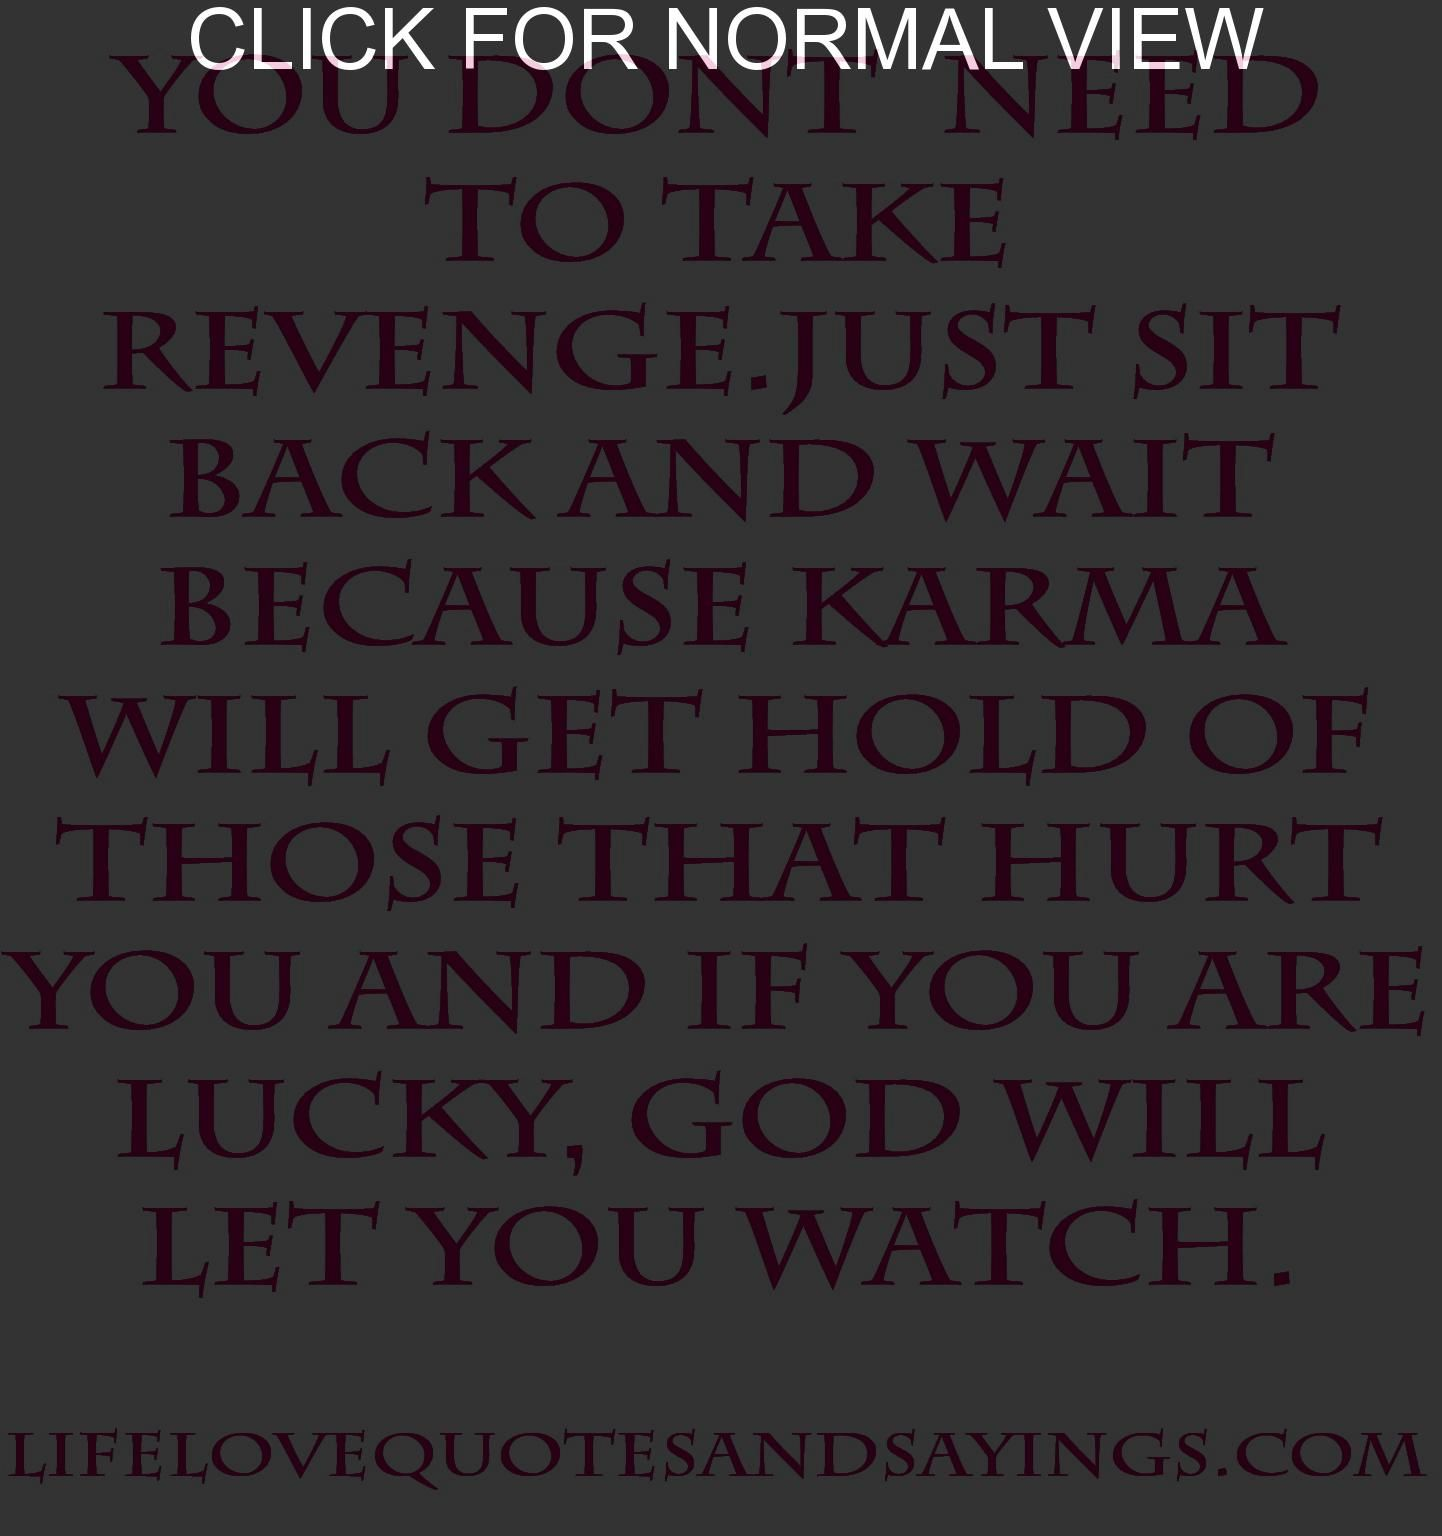 A theme of holding back on getting revenge in hamlet